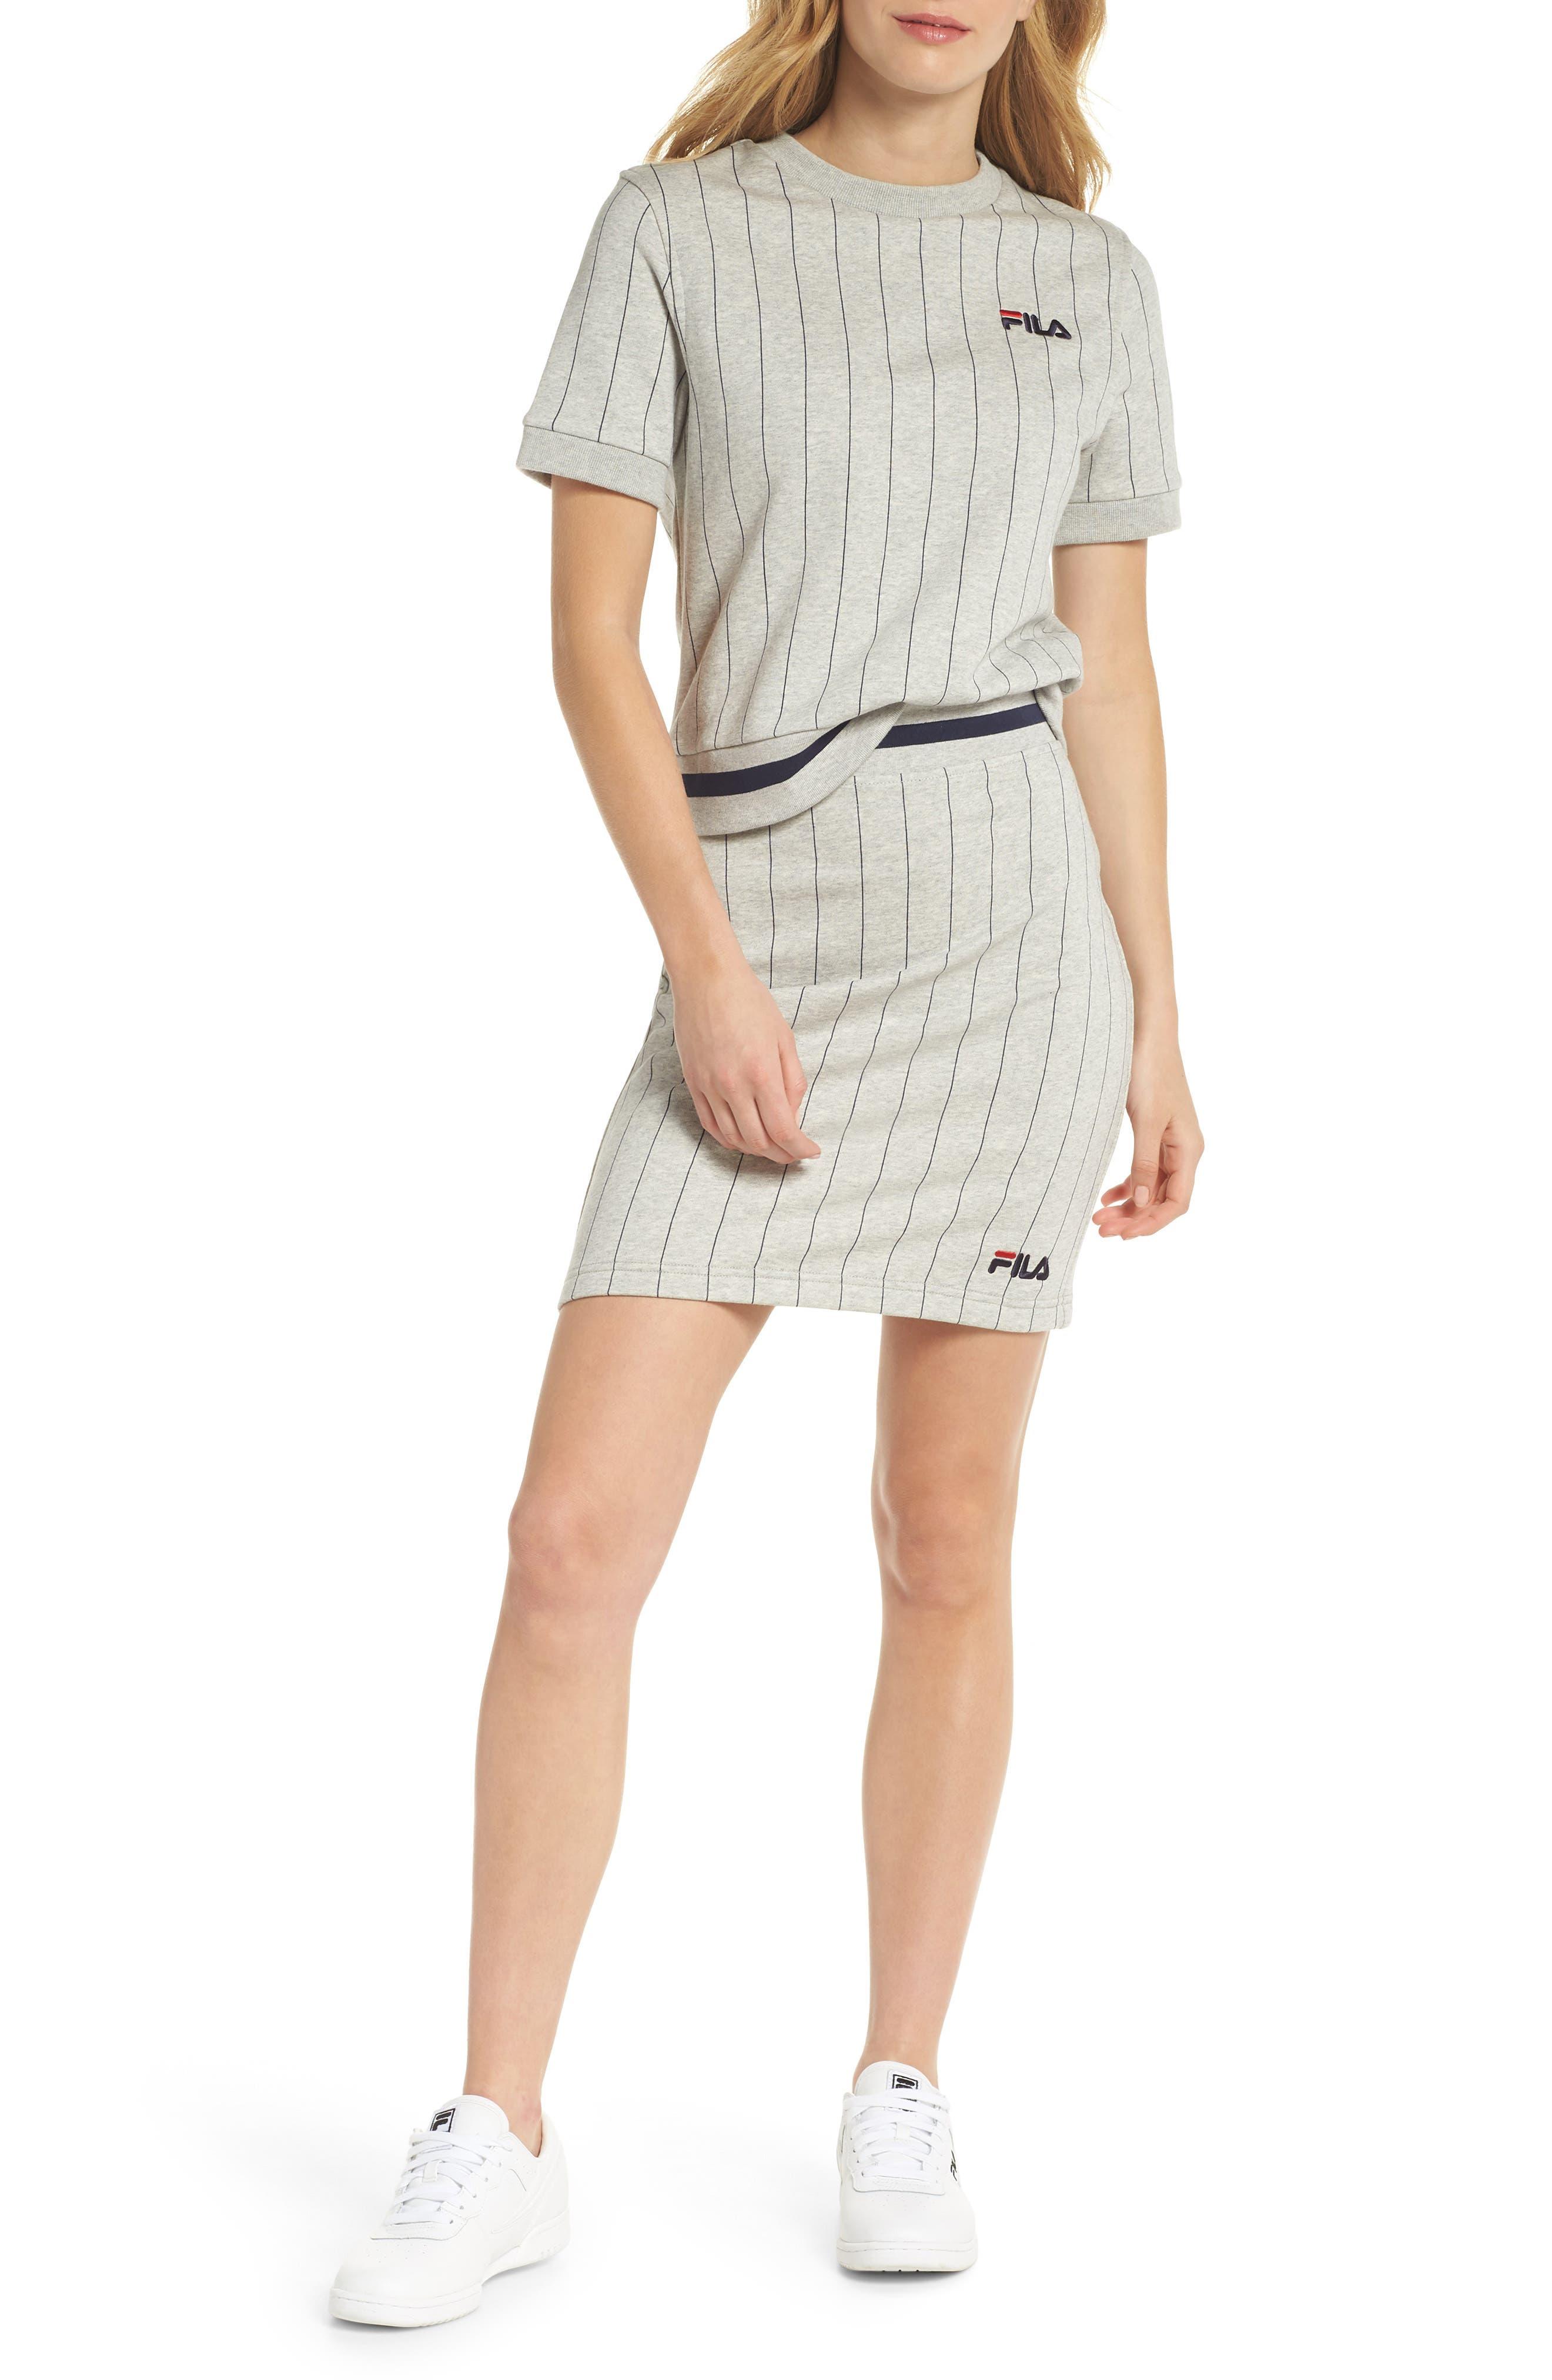 Francesca Pinstripe Skirt,                             Alternate thumbnail 2, color,                             Light Grey Marl/ Peacoat